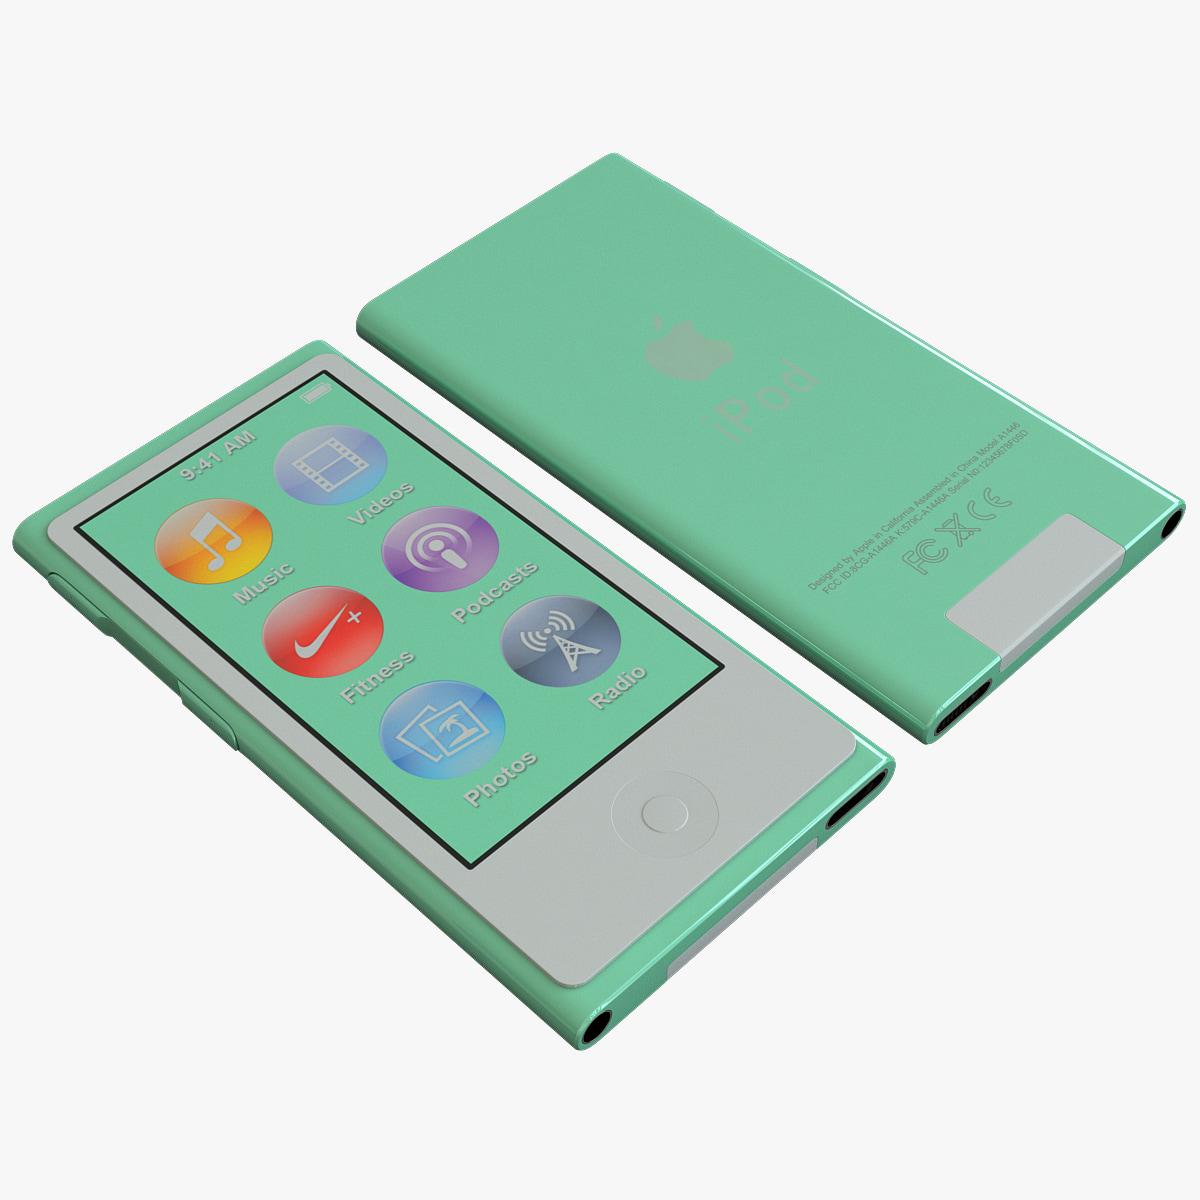 Ipod_Nano_Generation_7th_Green_000.jpg